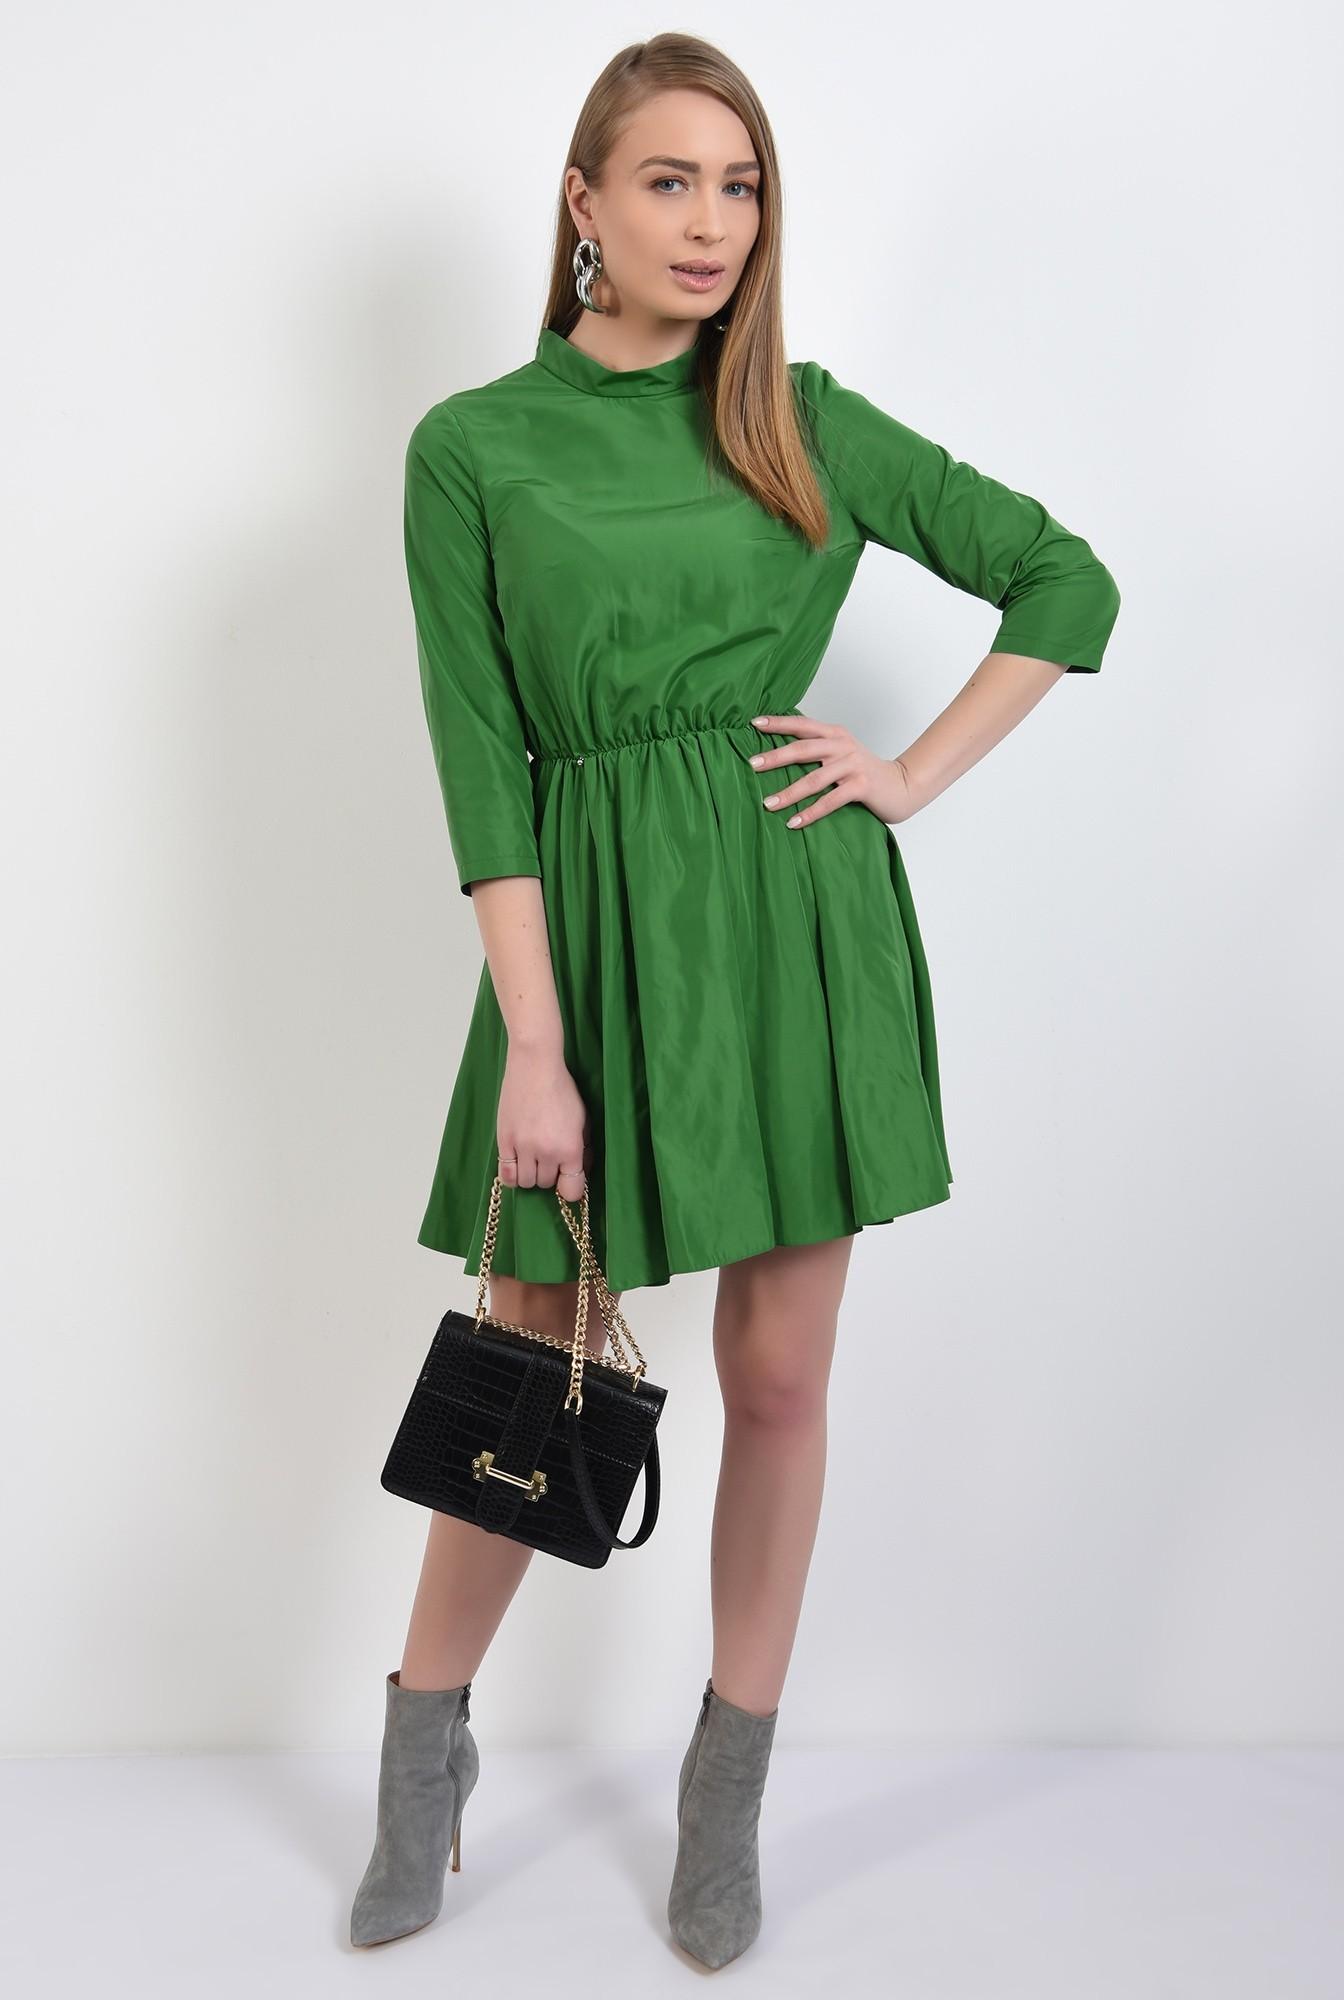 3 -  rochie mini, clos, maneci midi, guler mic, rochie de primavara, nasturi pe spate